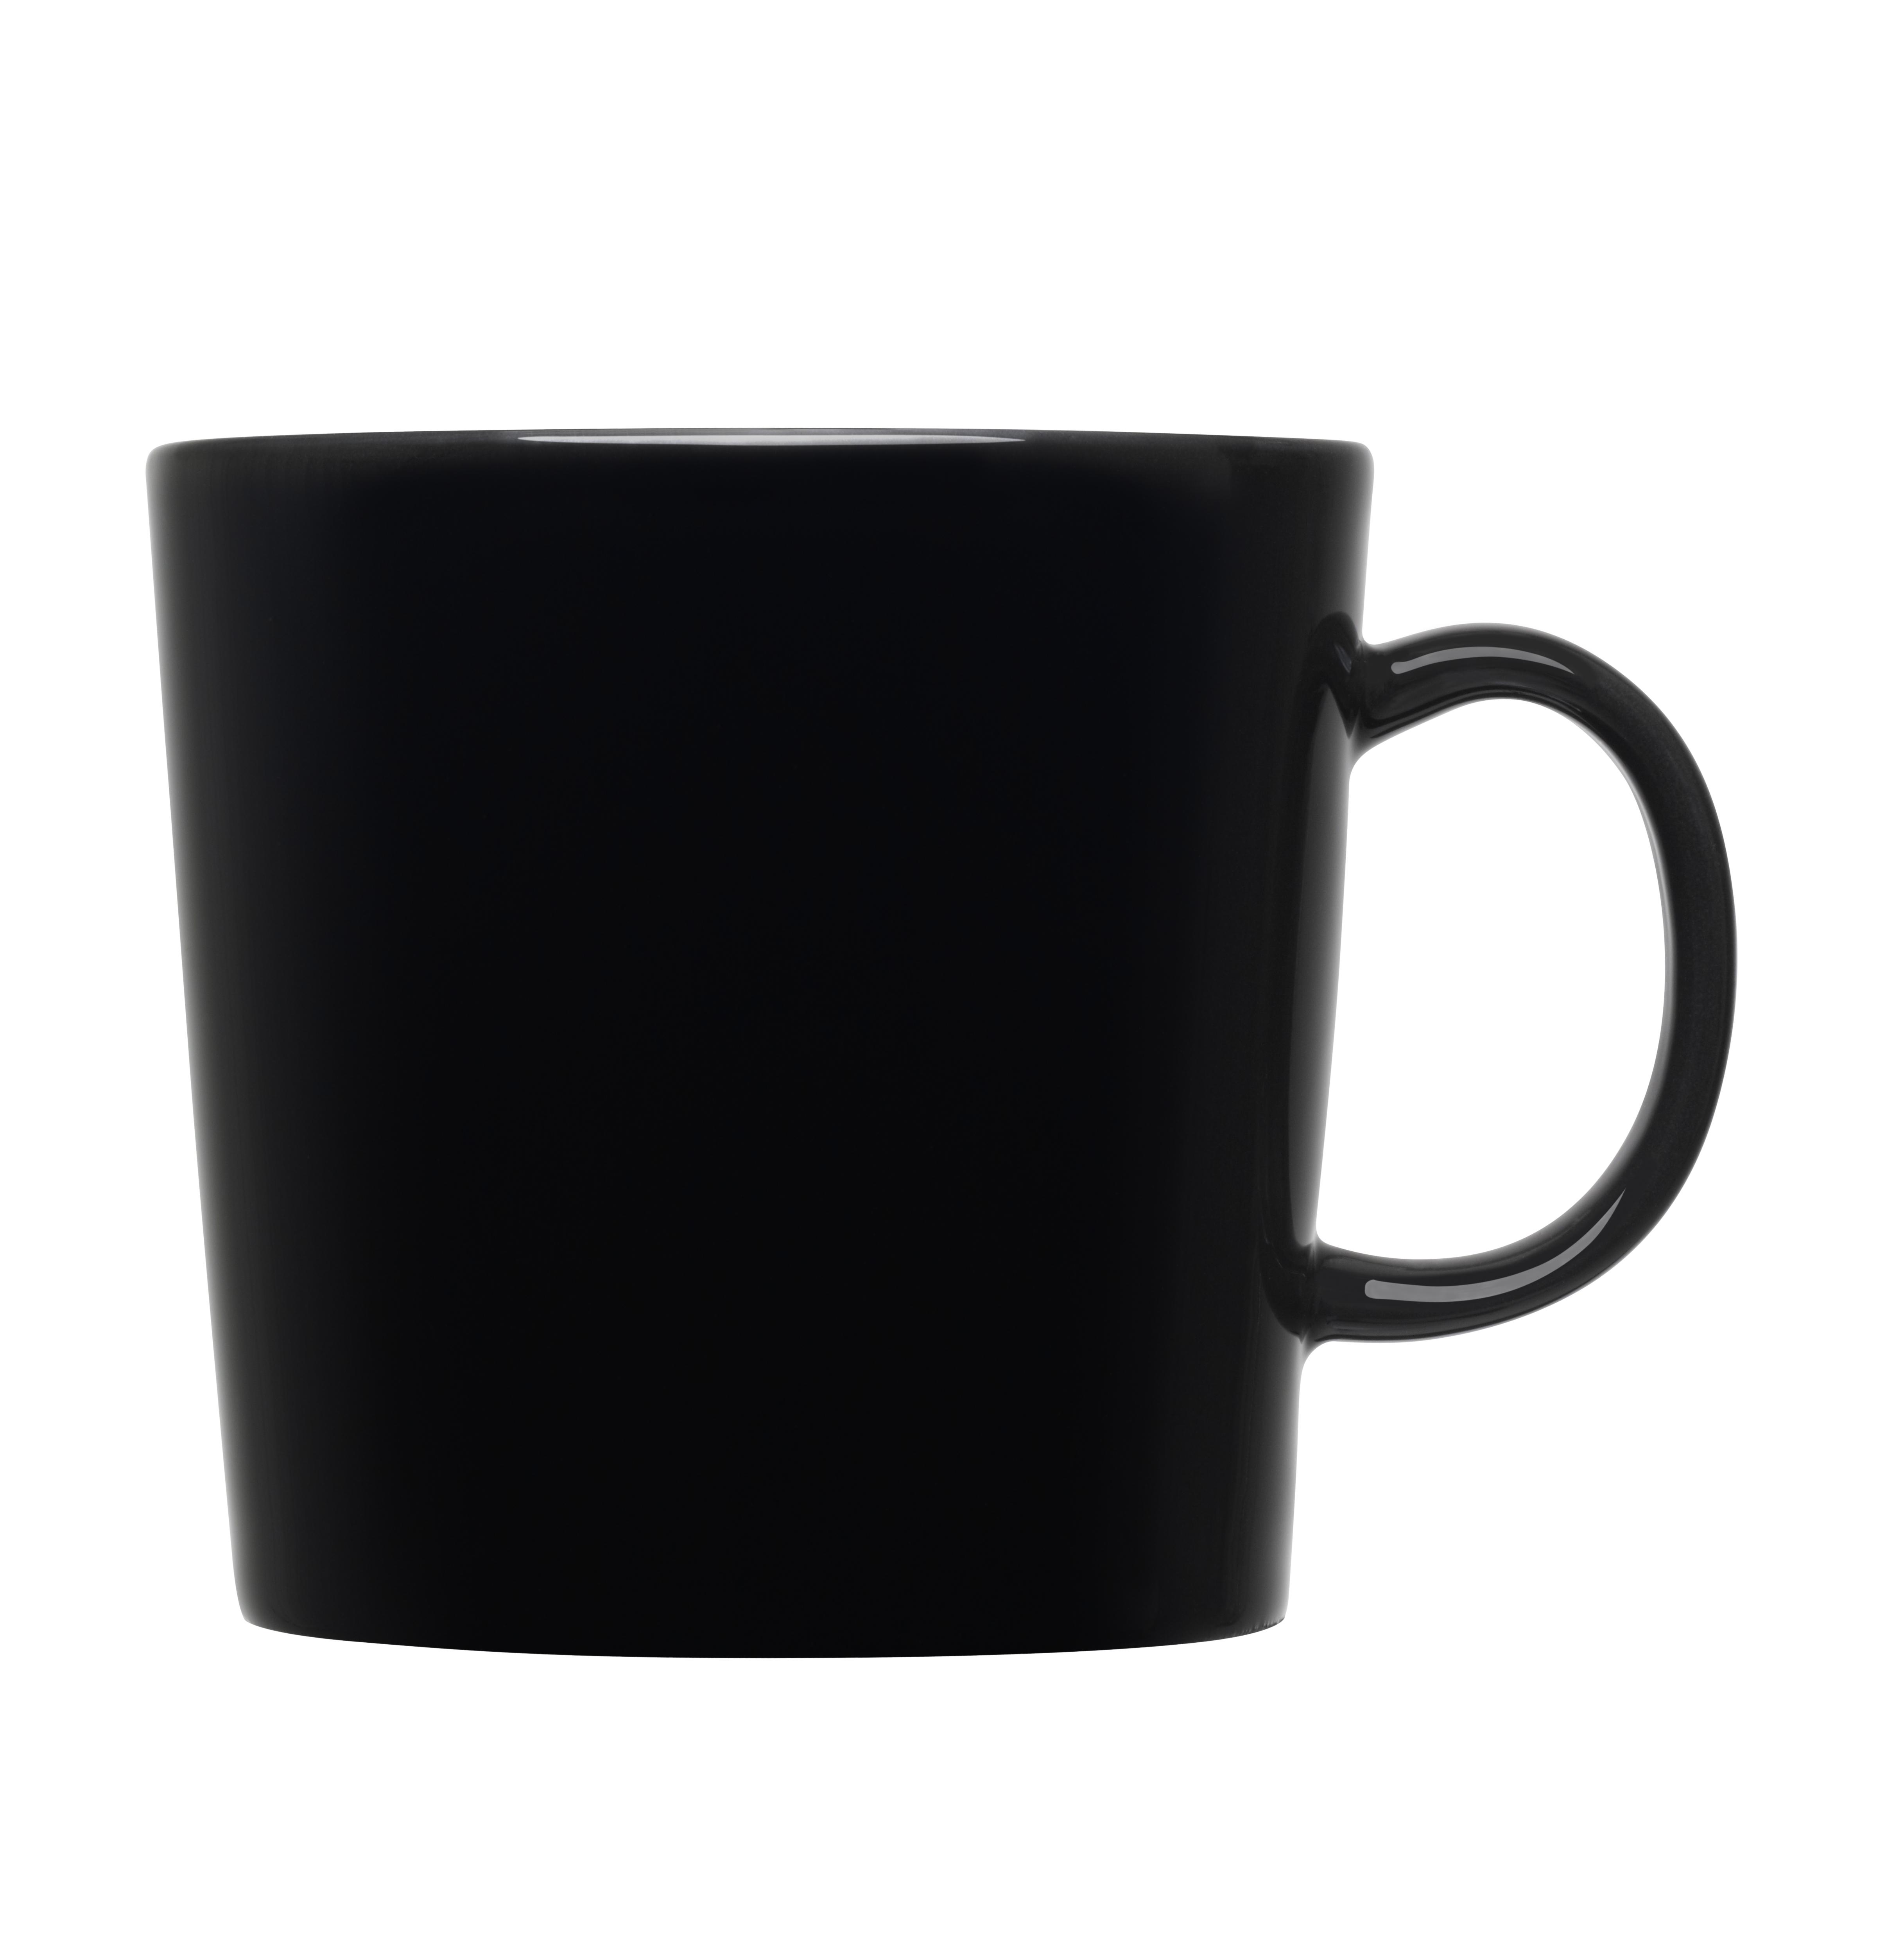 Teema Mugg 40cl svart